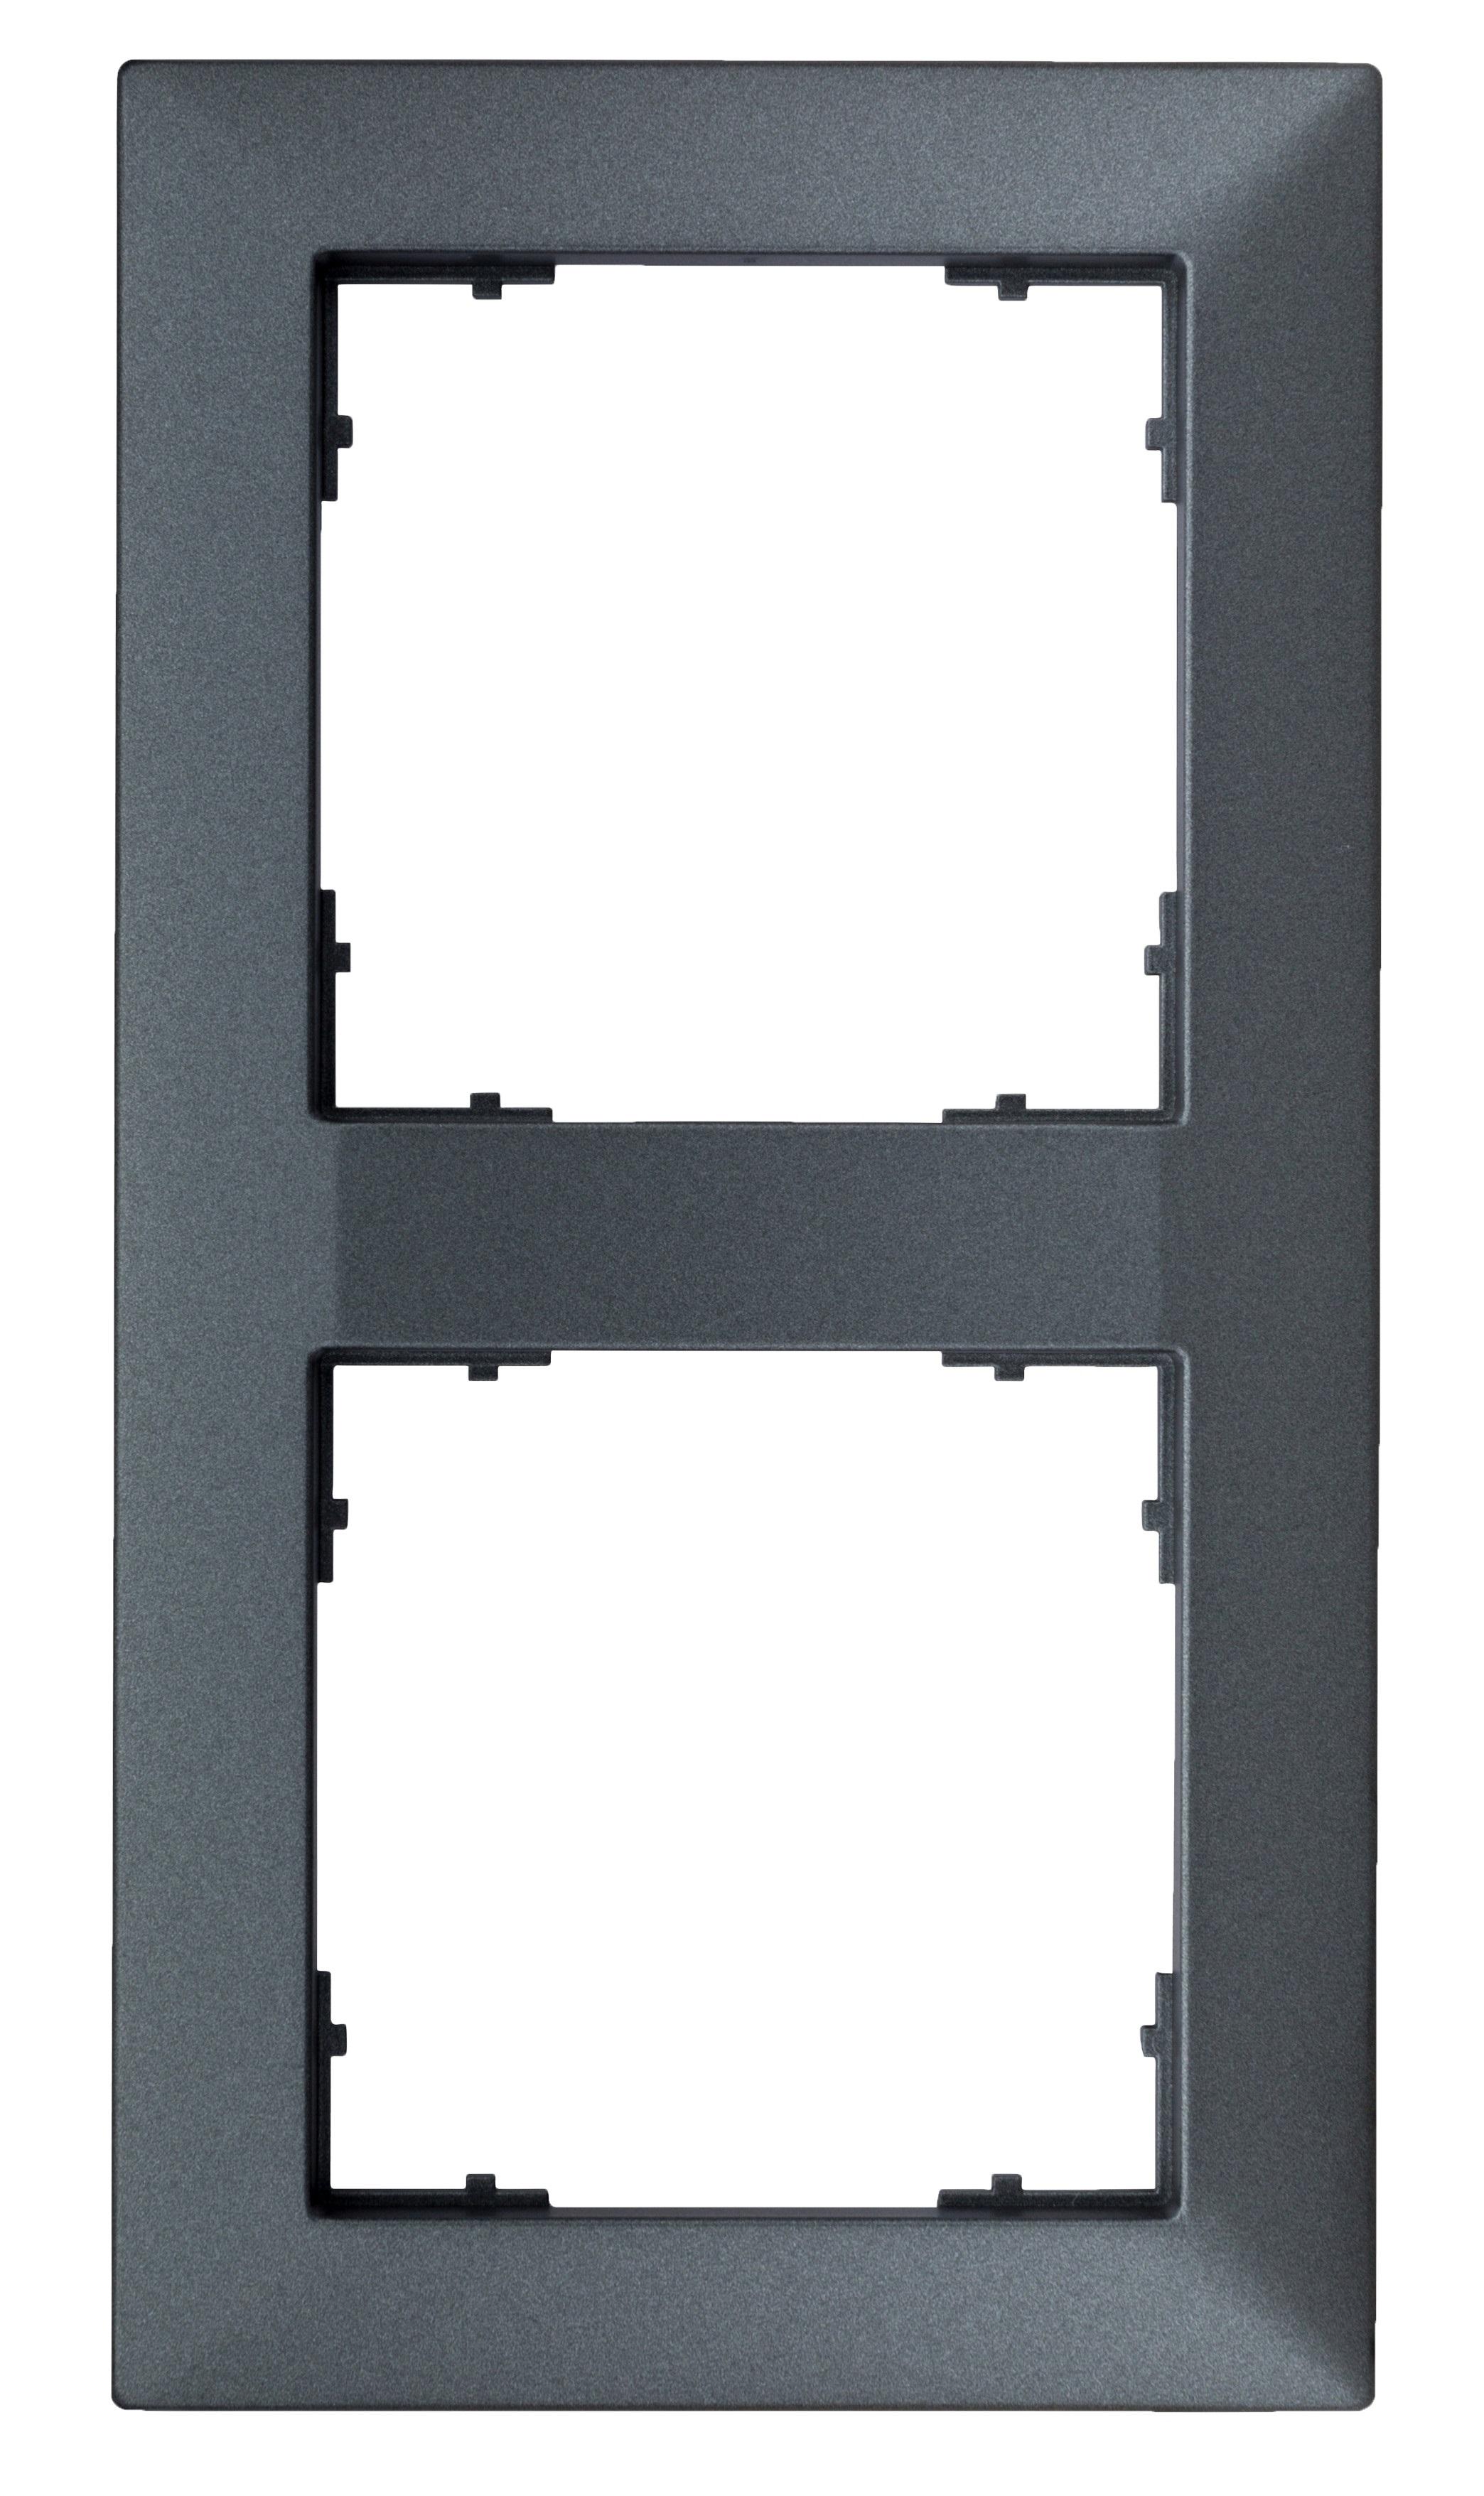 1 Stk Rahmen 55x55mm, 2-fach, anthrazit EV115022--